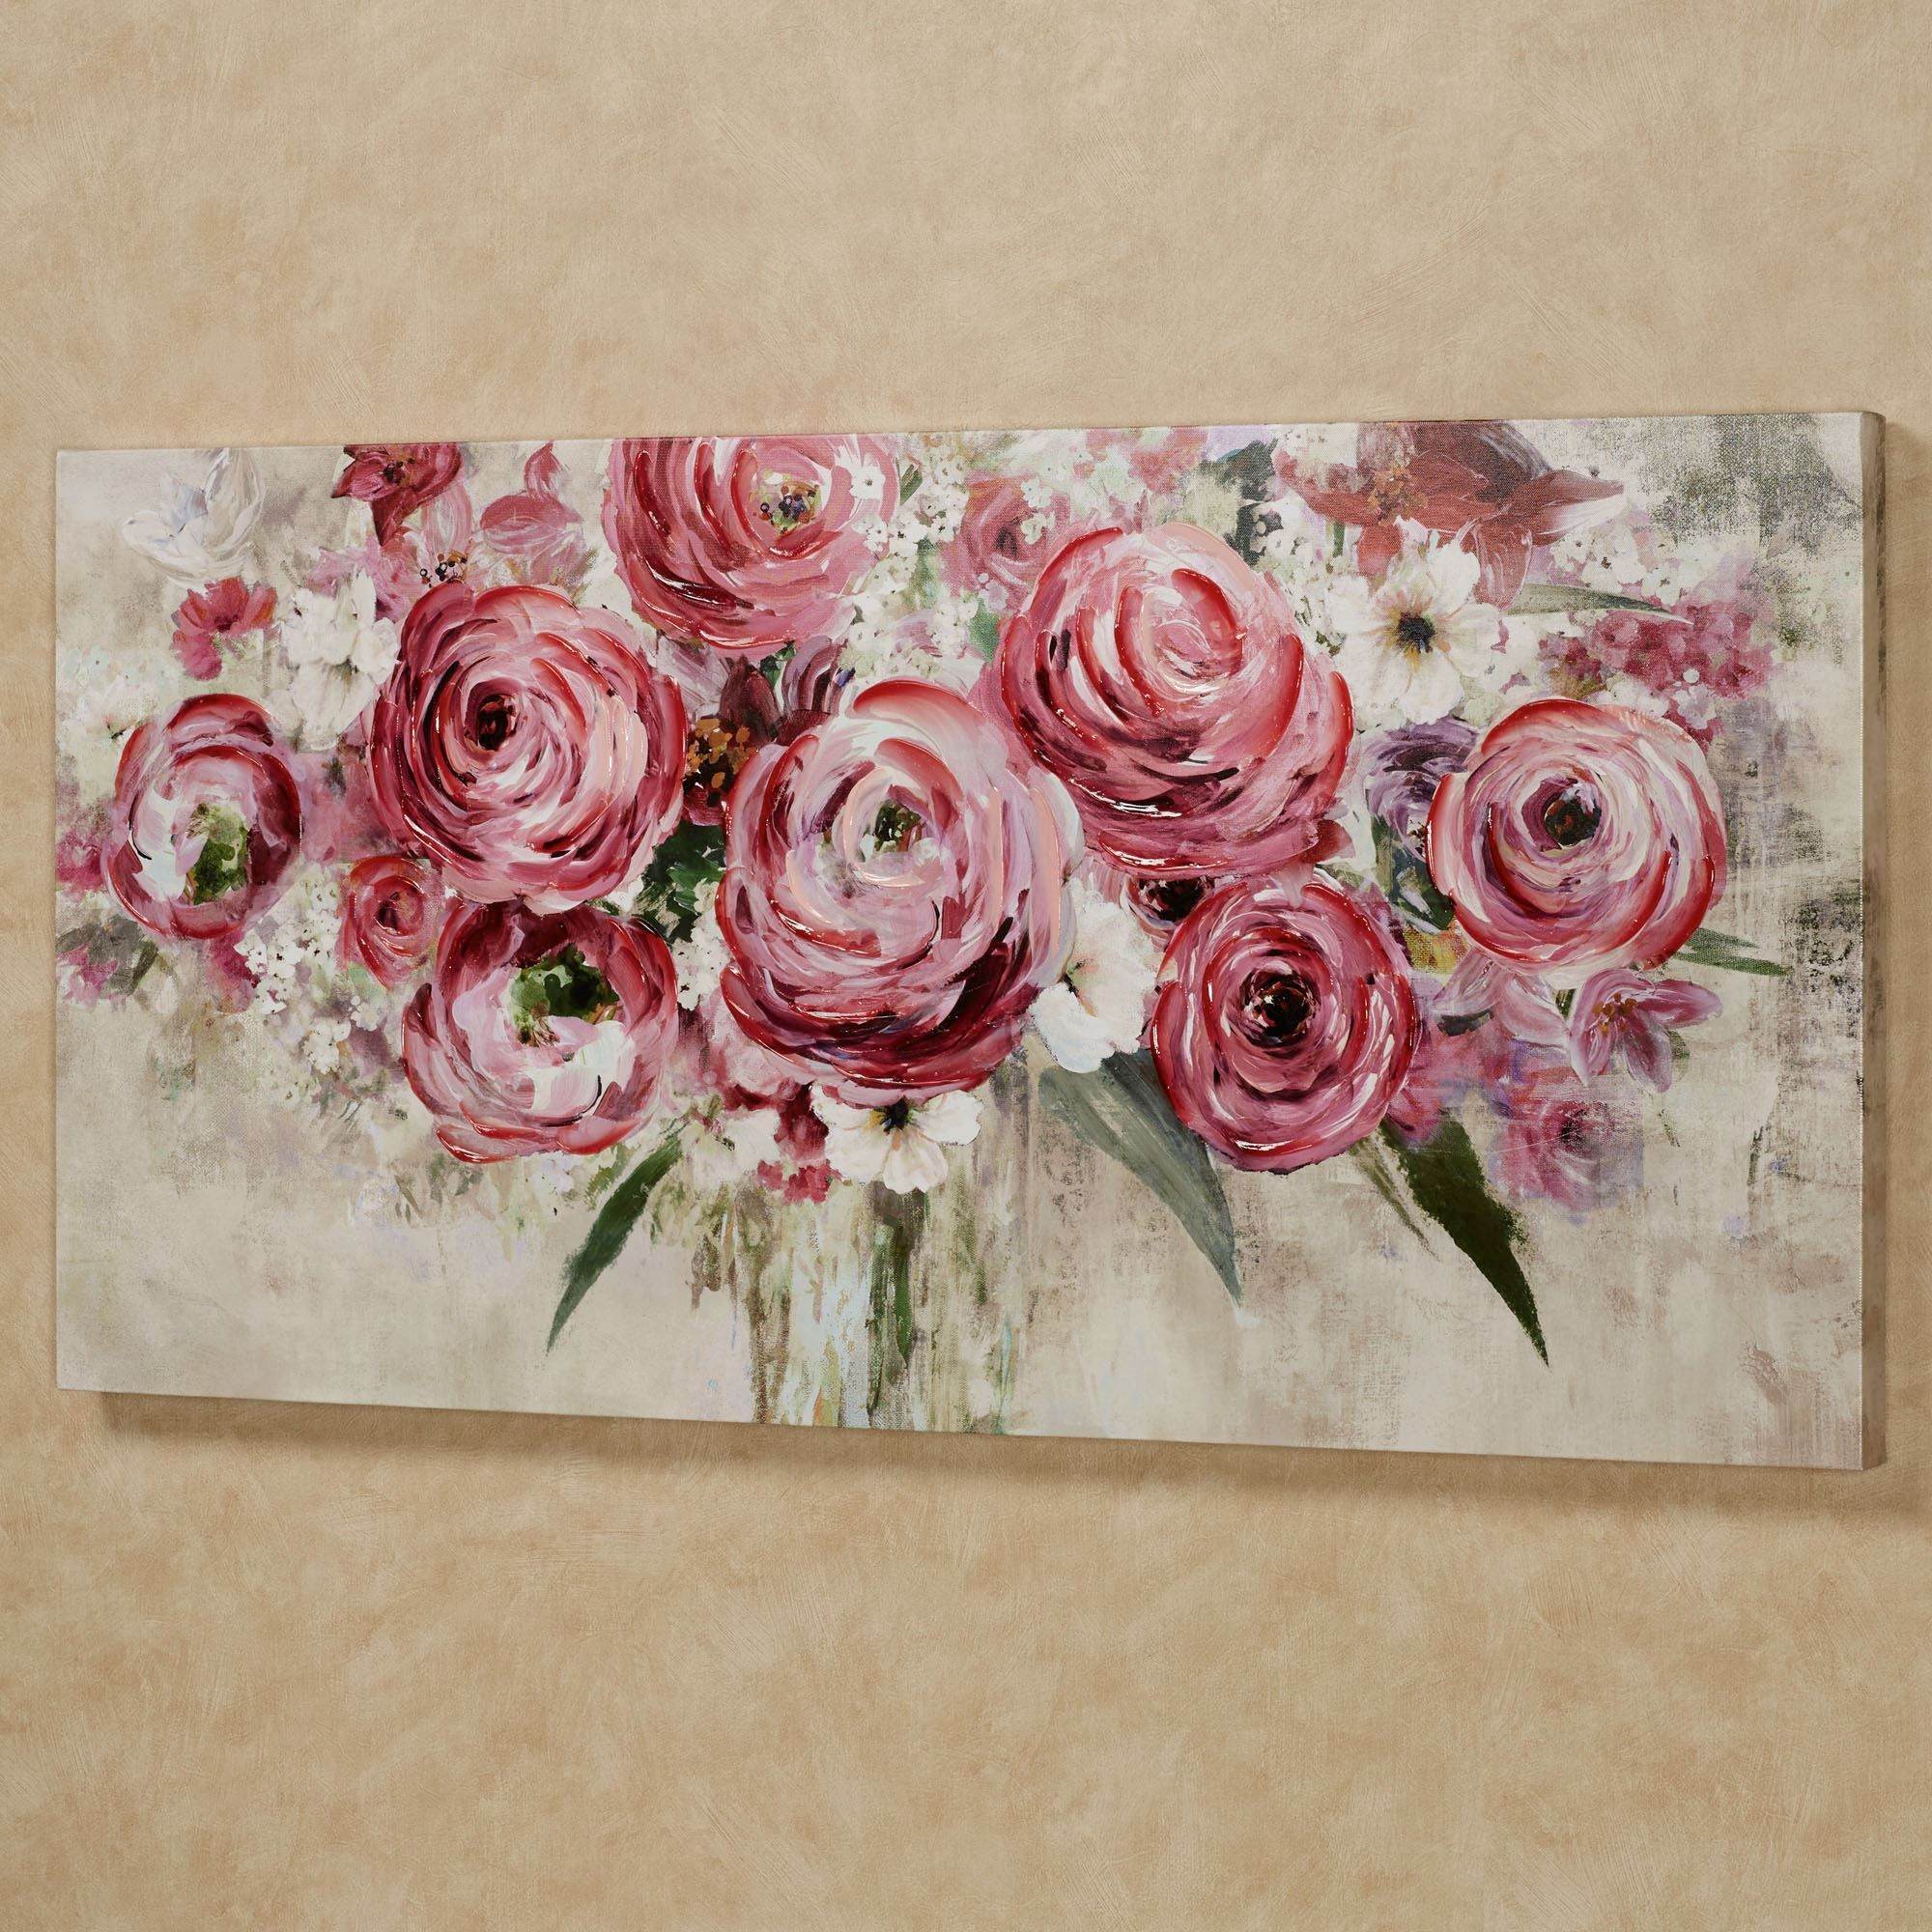 Rosa Impressions Floral Canvas Wall Art Flower Art Painting Floral Wall Art Canvases Flower Painting Canvas